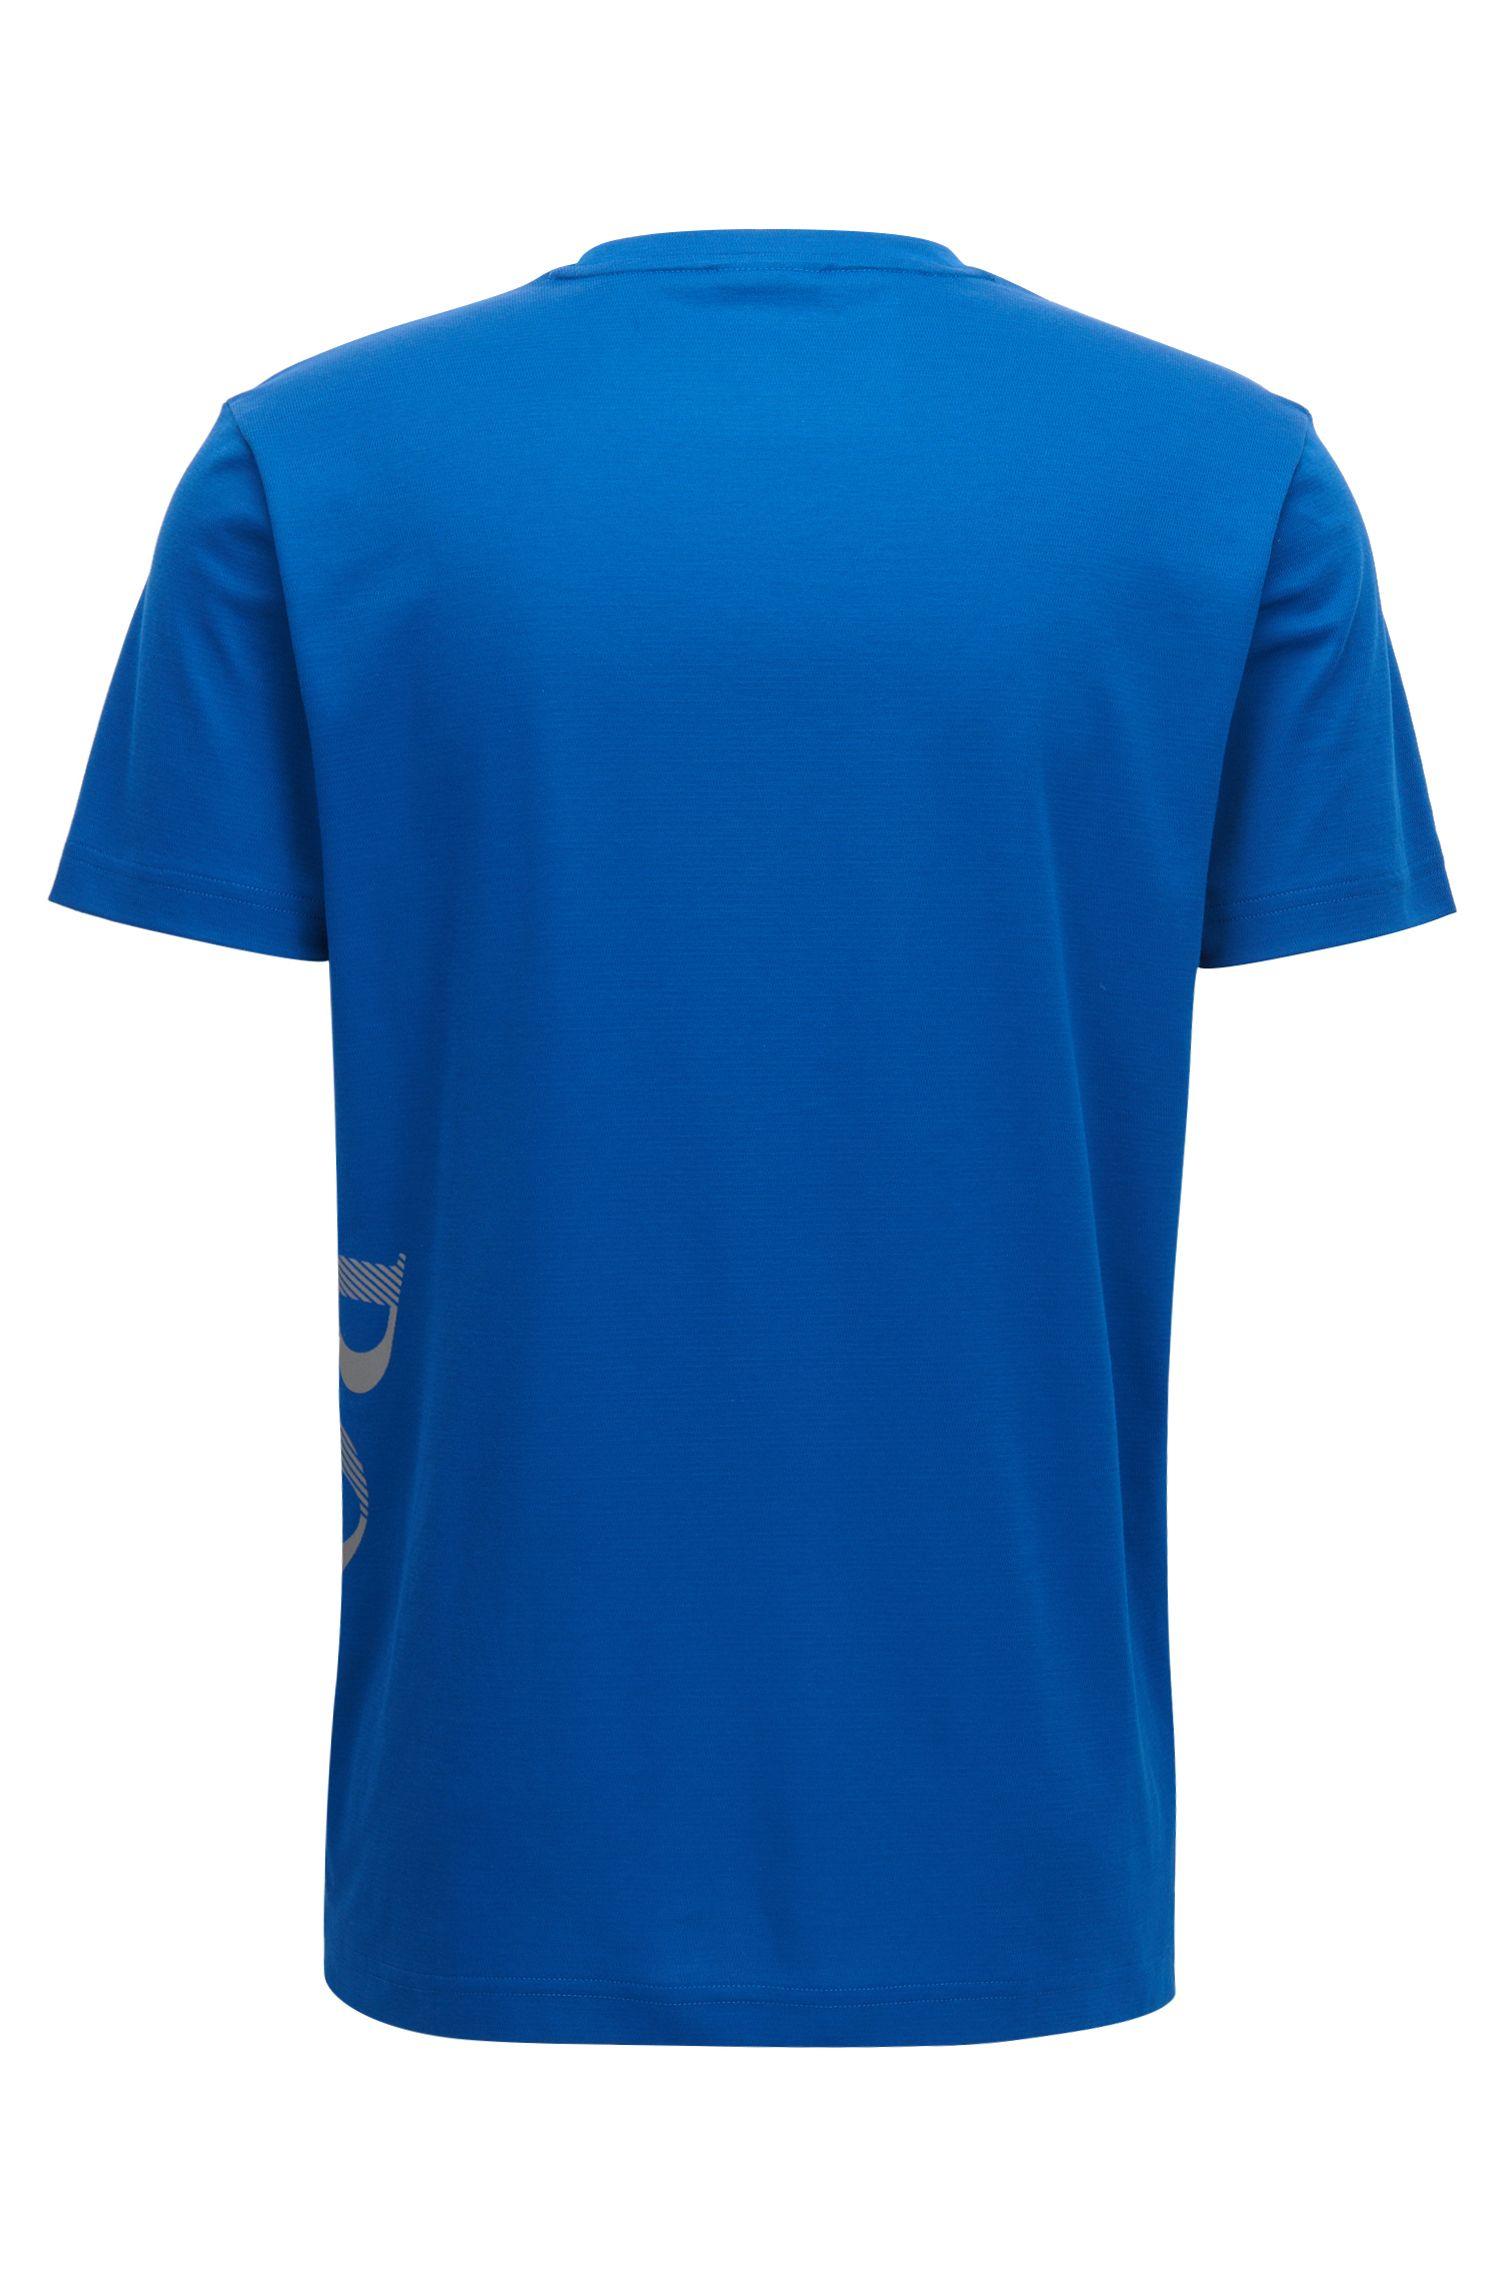 Moisture Management Cotton Blend T-Shirt | TL Tech, Blue